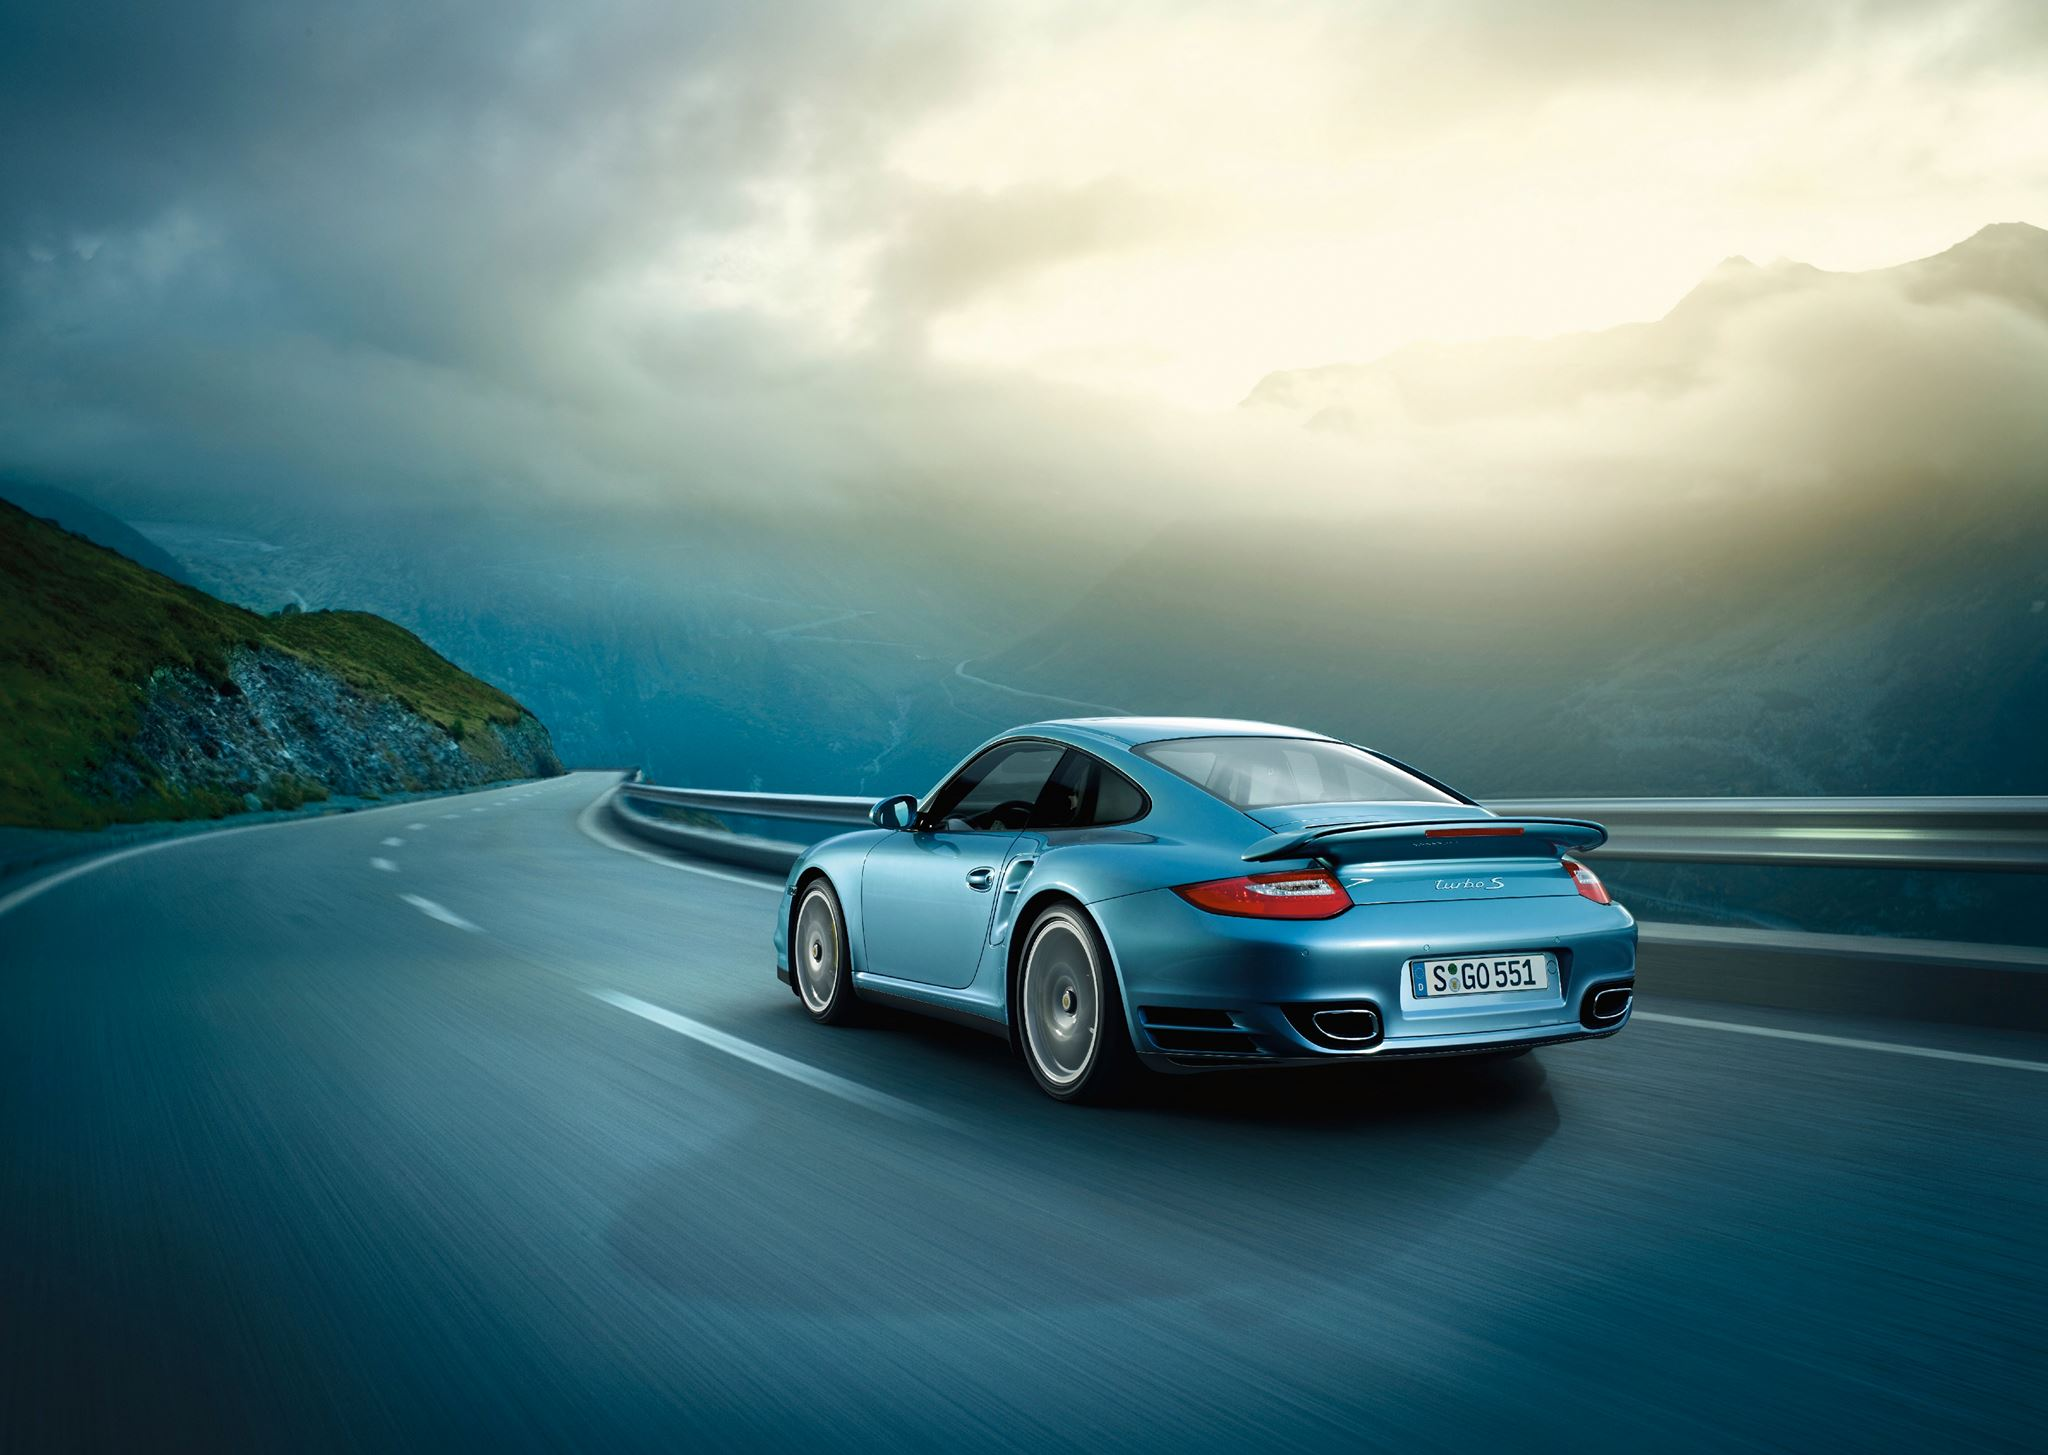 Read more about the article Porsche Cayman S Vs Porsche 924 Turbo Photoshoot